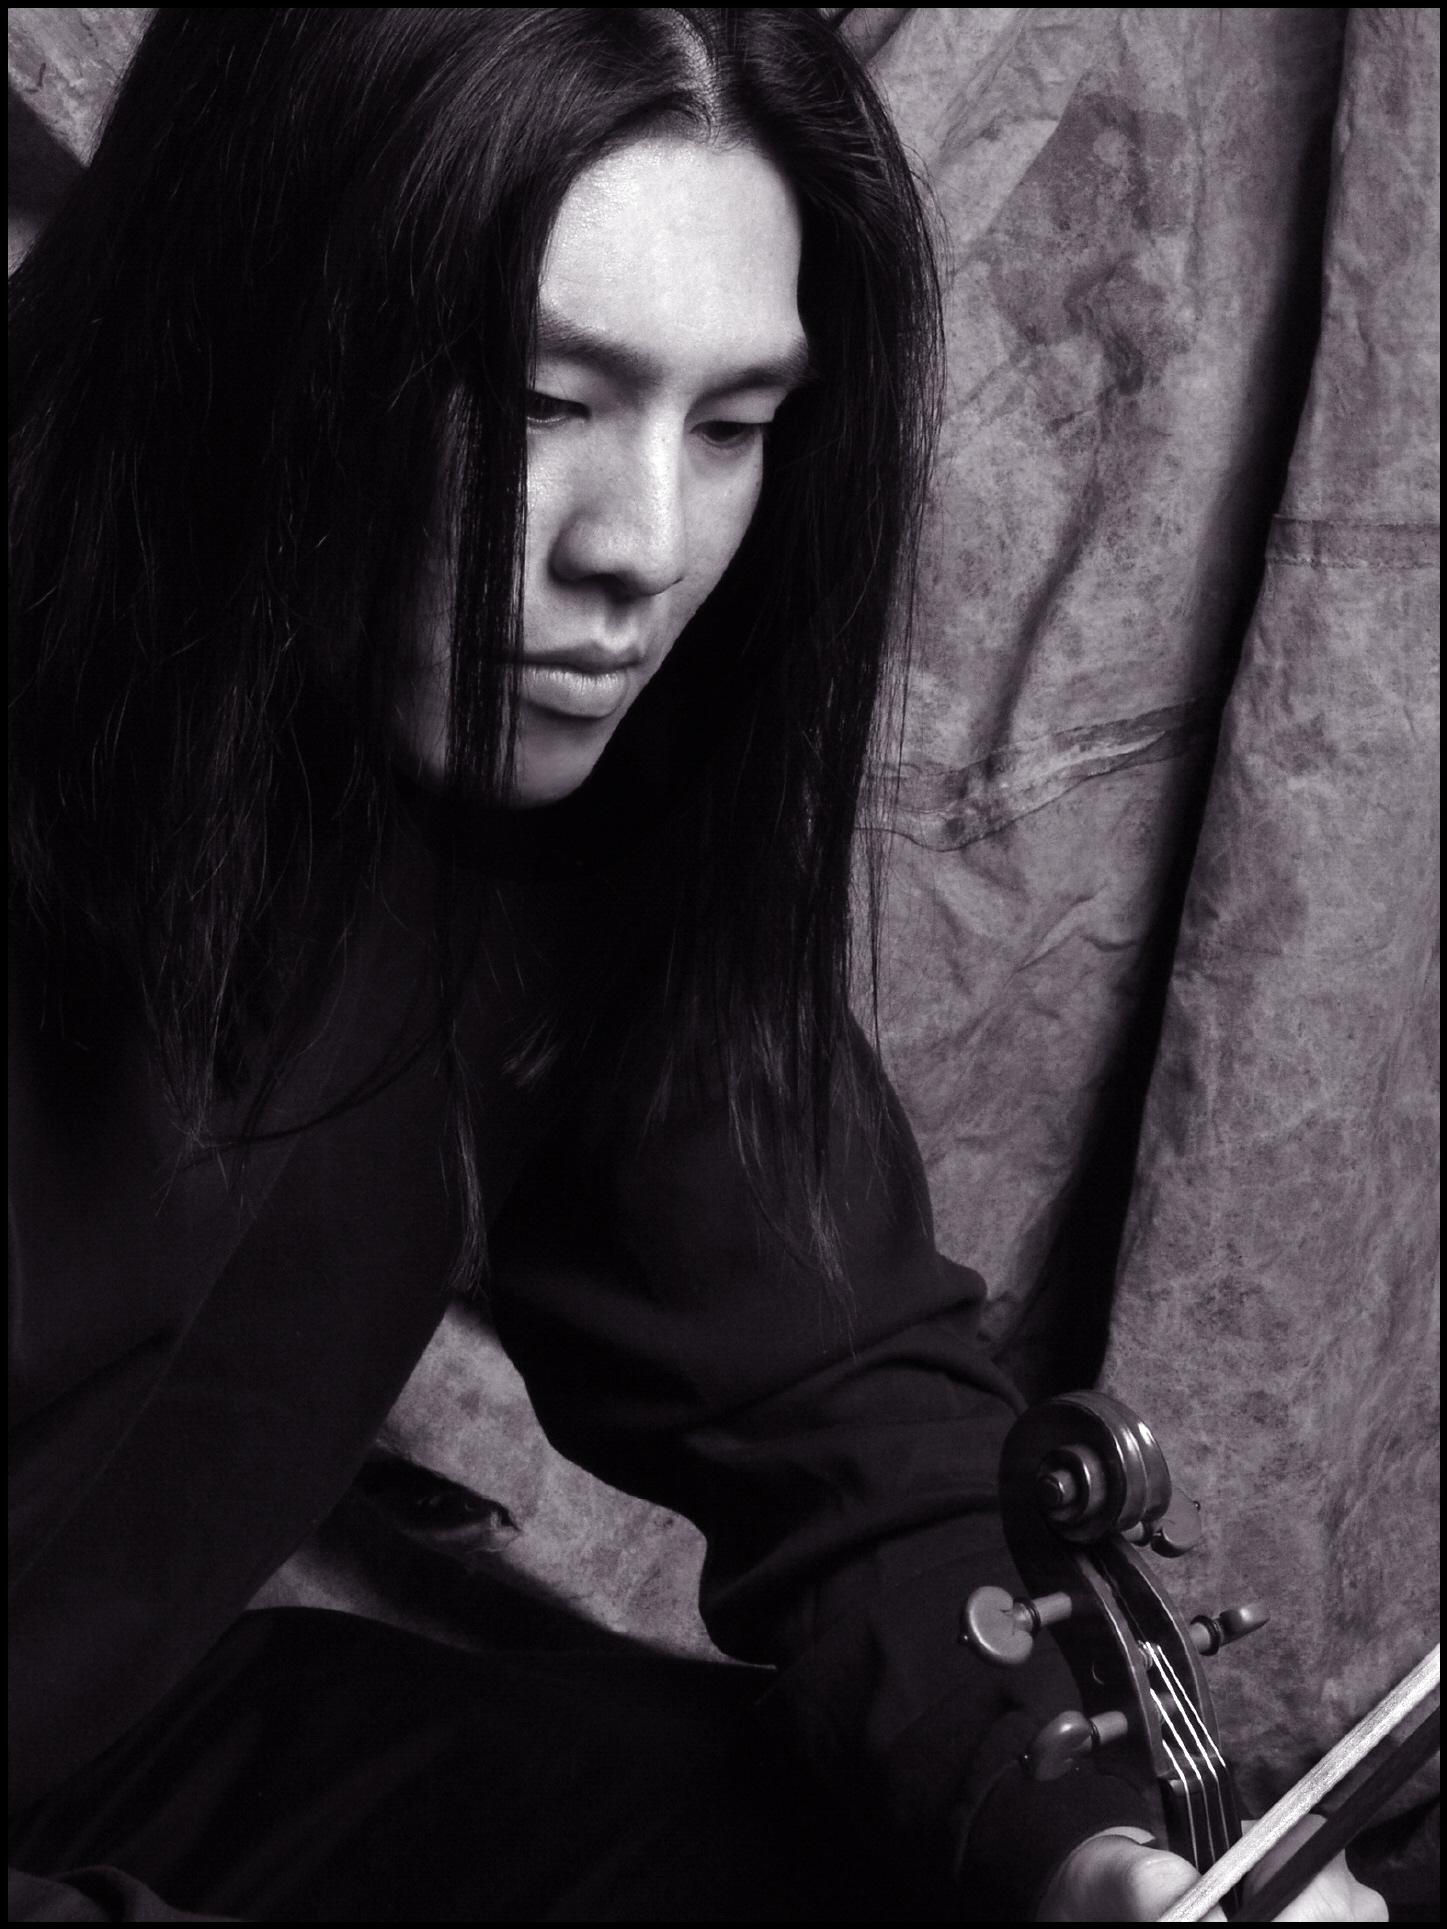 Yang_violin